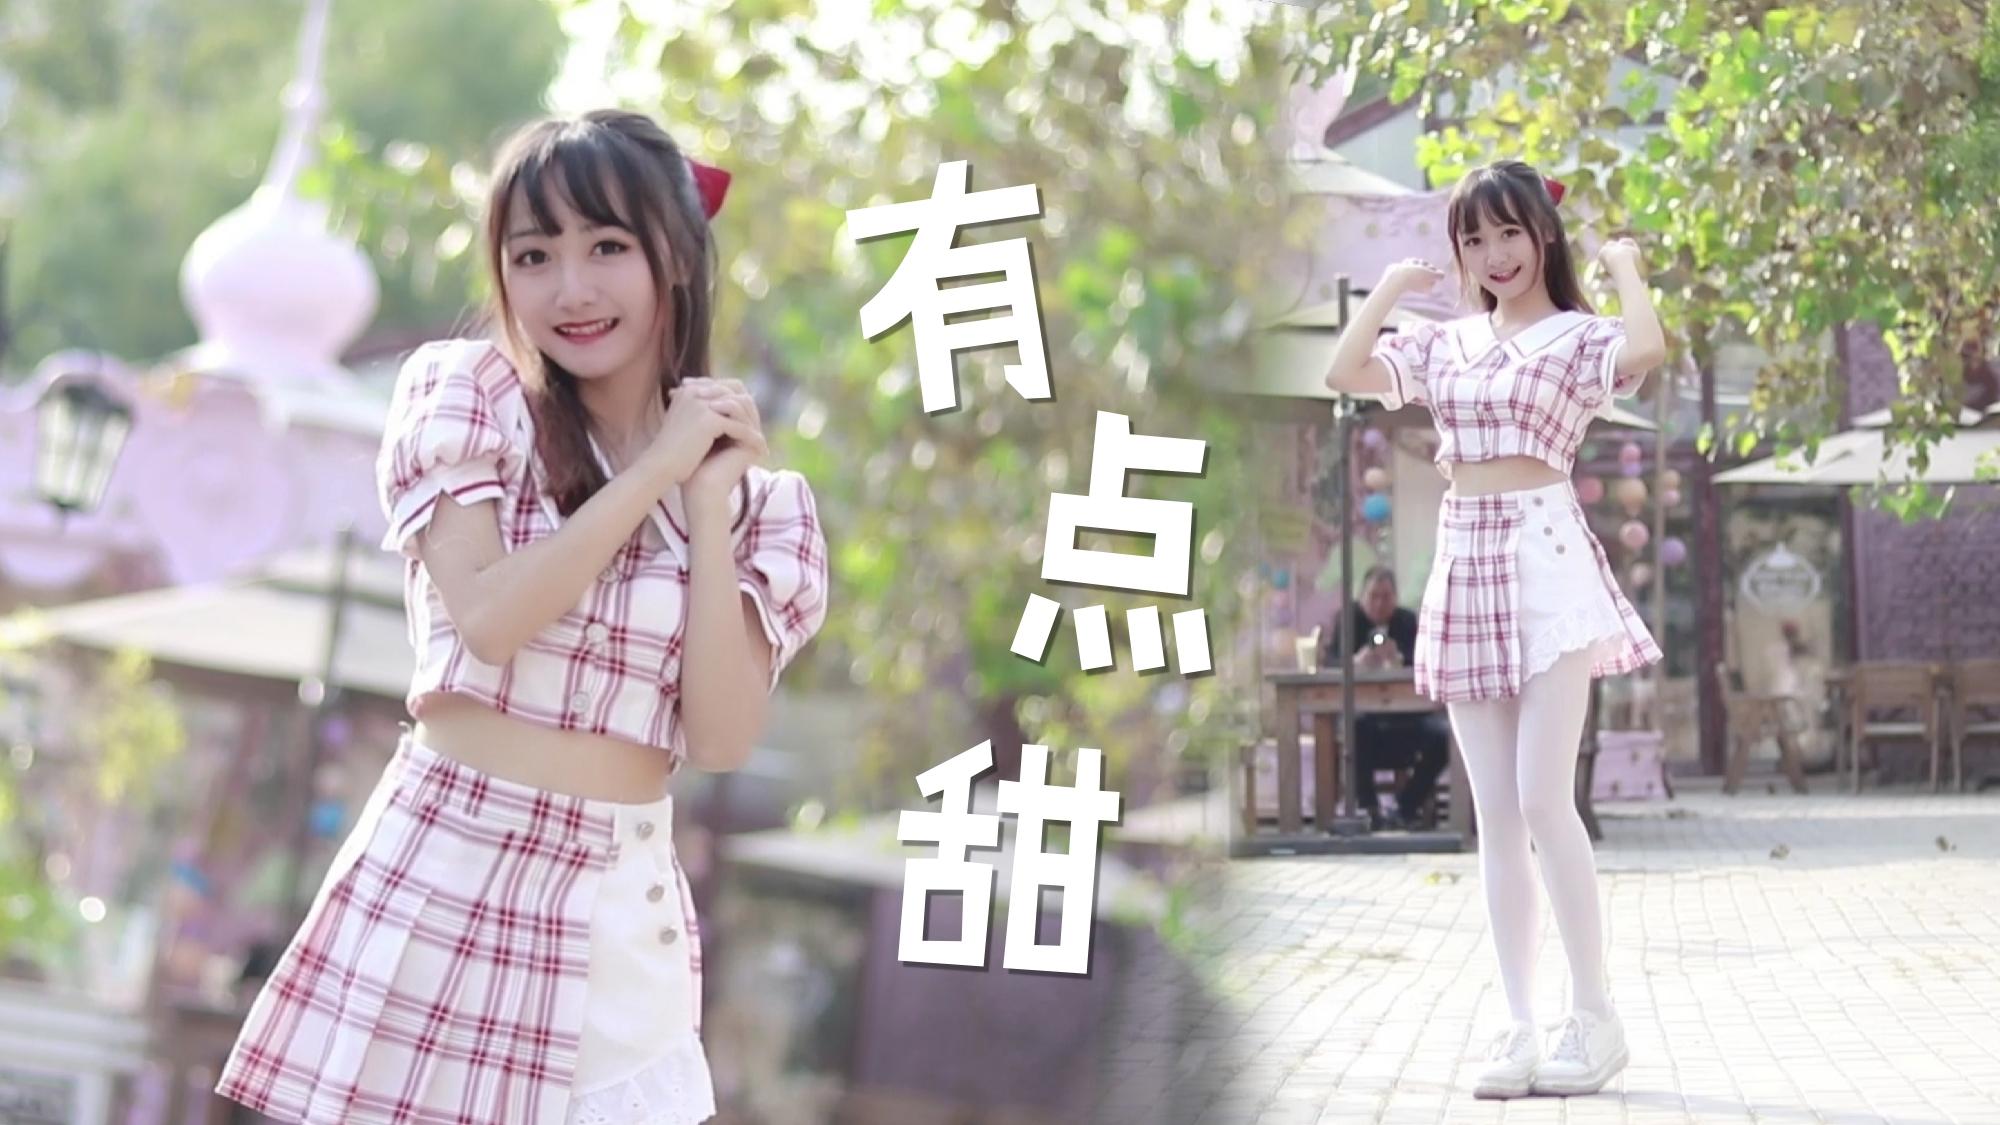 ❀A站首发❀【踢馆出道上春晚】失踪人口突然出现!!!